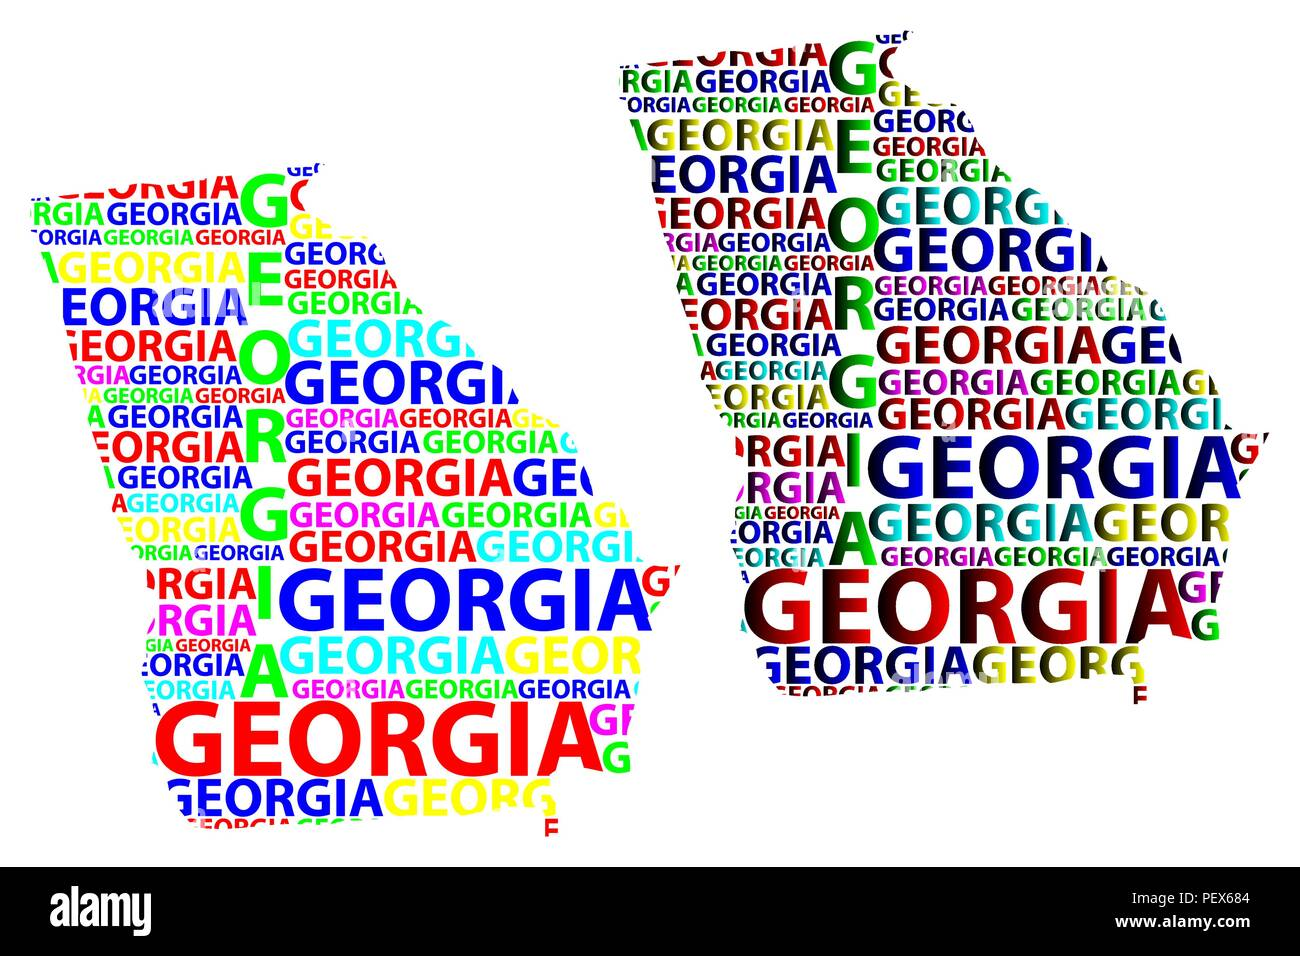 United States Map Georgia.Sketch Georgia United States Of America Letter Text Map Georgia